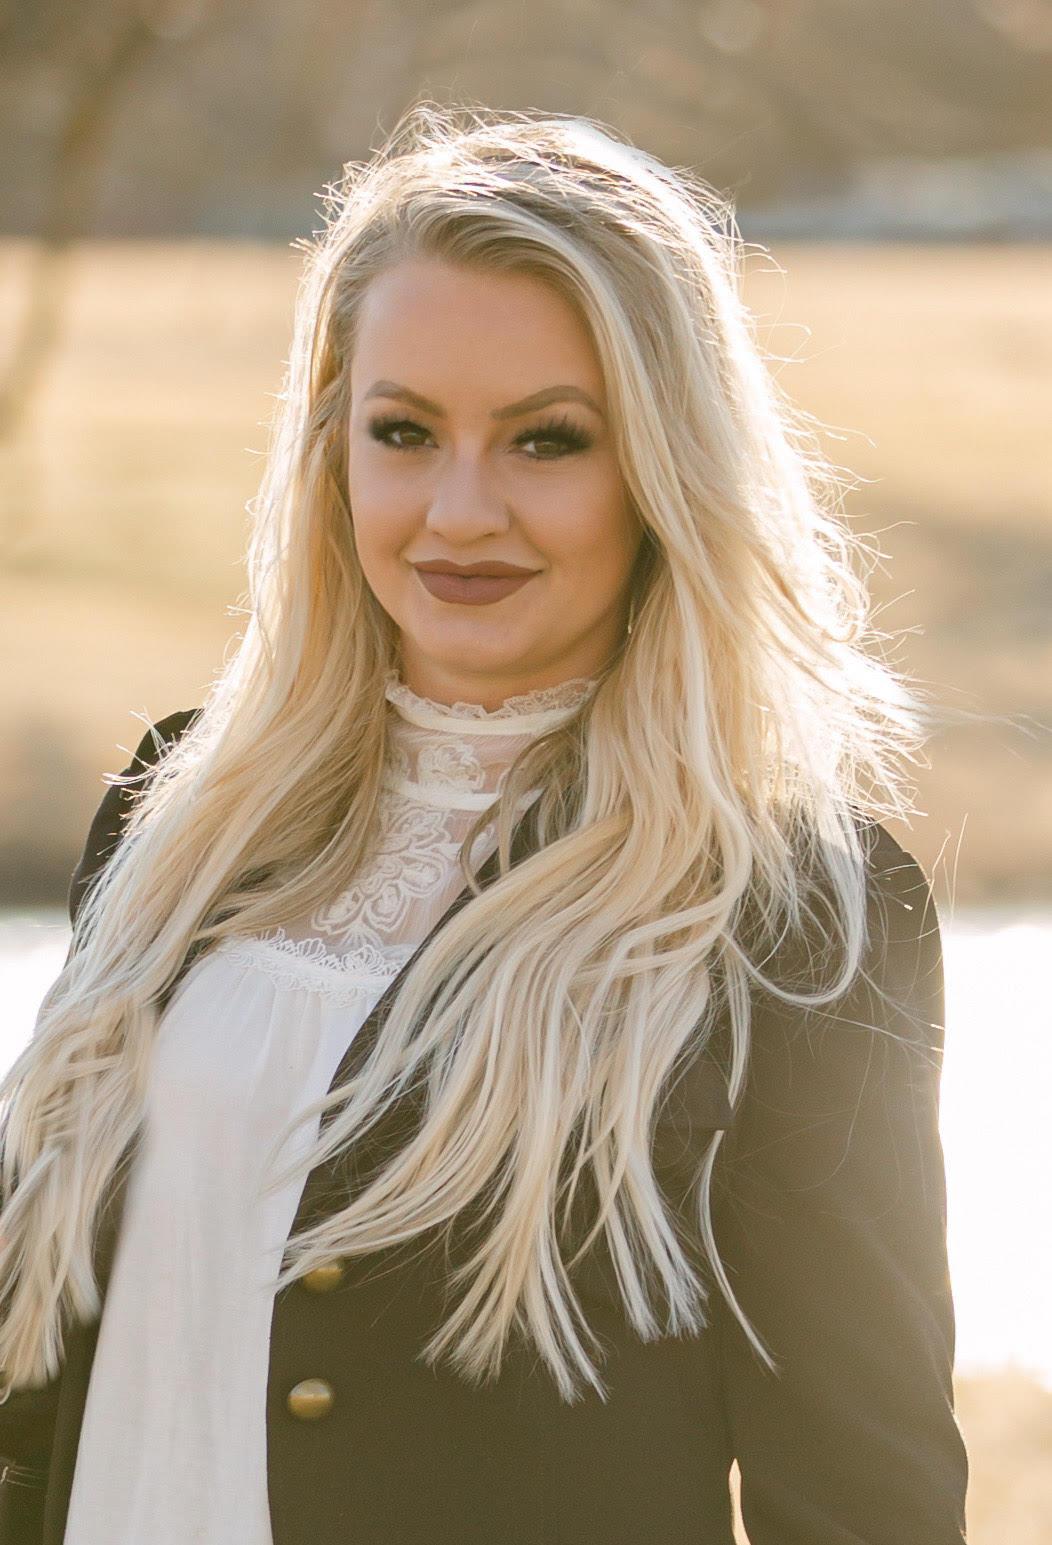 Jenna Smeenk